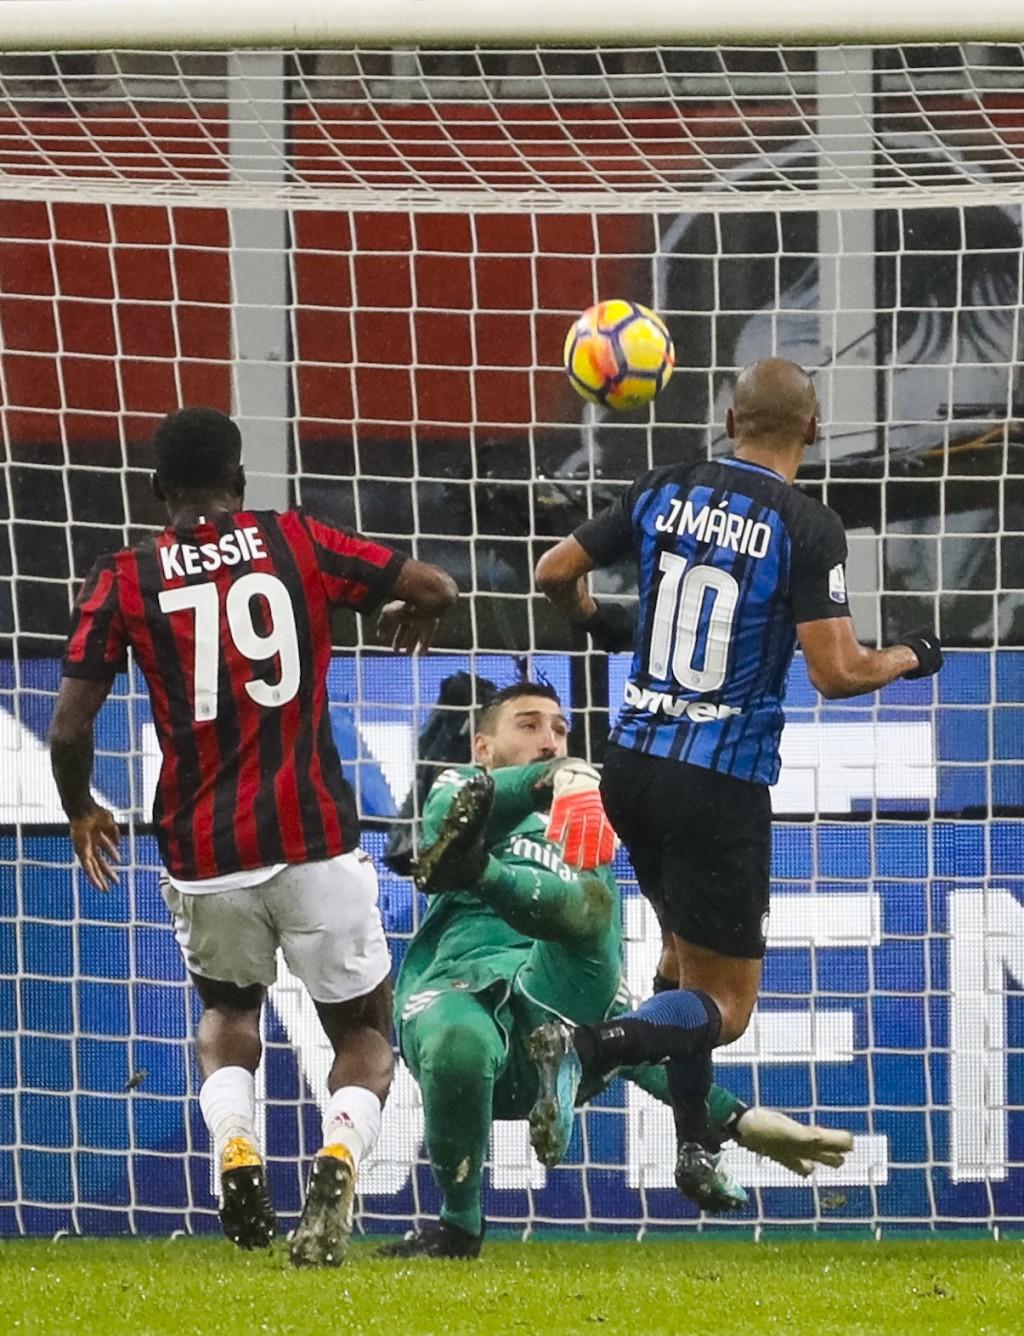 AC Milan goalkeeper Antonio Donnarumma, center, blocks a ball shot by Inter Milan's Joao Mario, right, as AC Milan's Franck Kessie defends during an I...